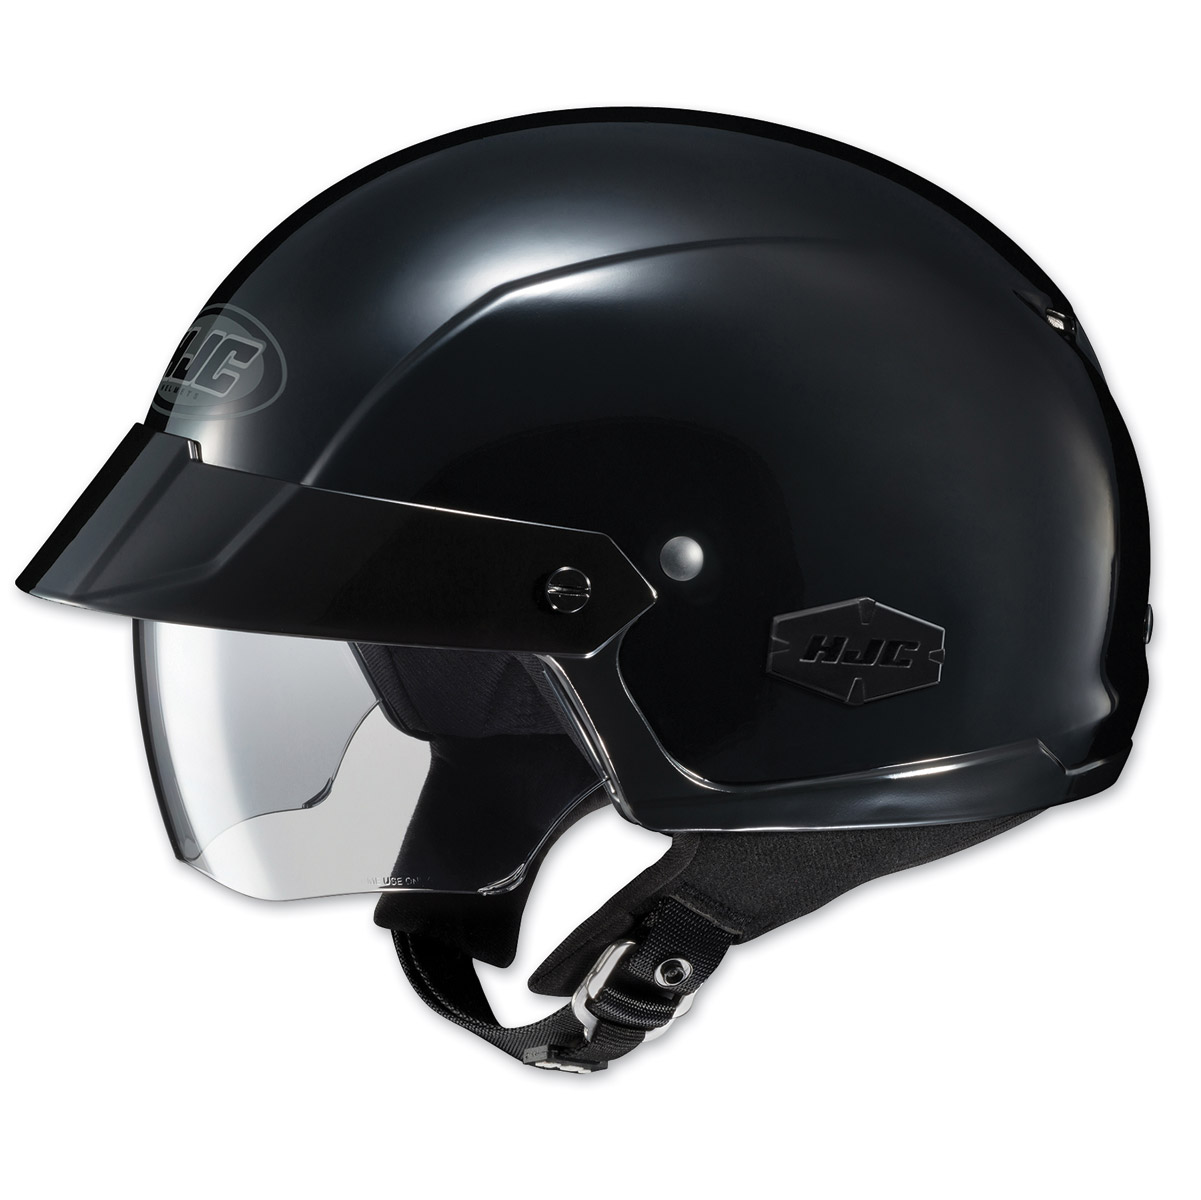 HJC IS-Cruiser Solid Black Half Helmet